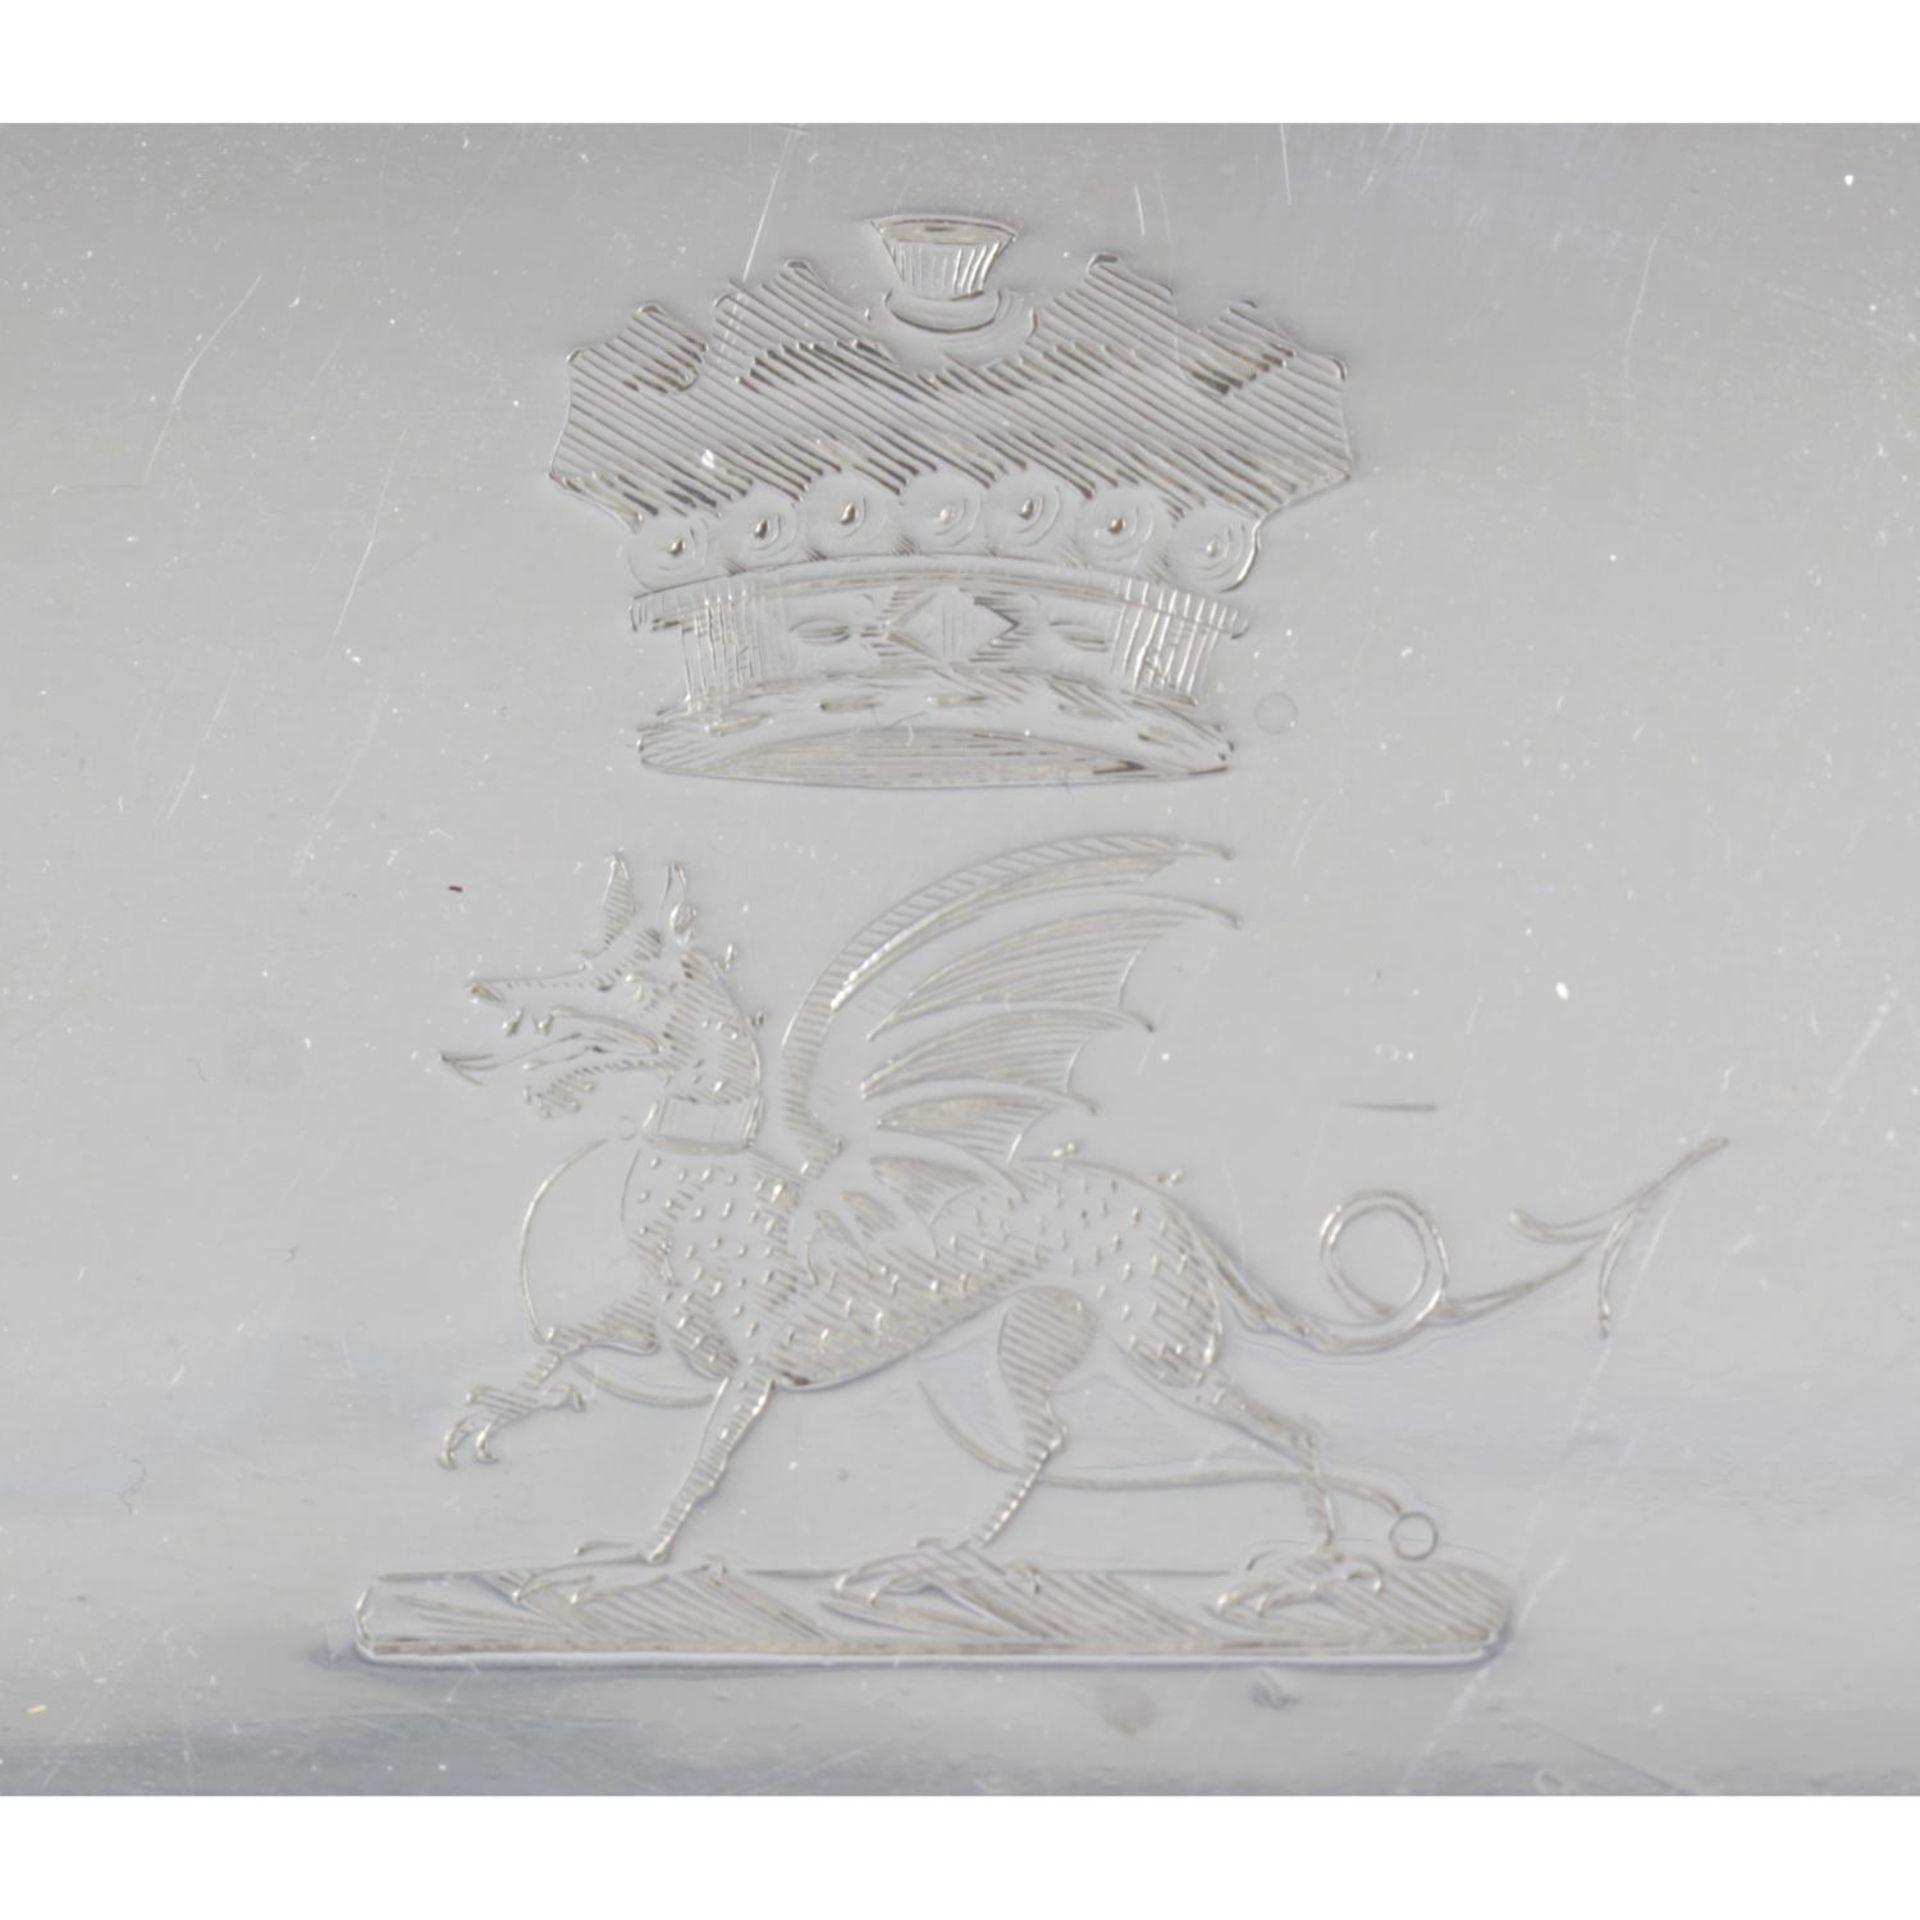 A George III silver swing-handled cake basket, - Image 5 of 6